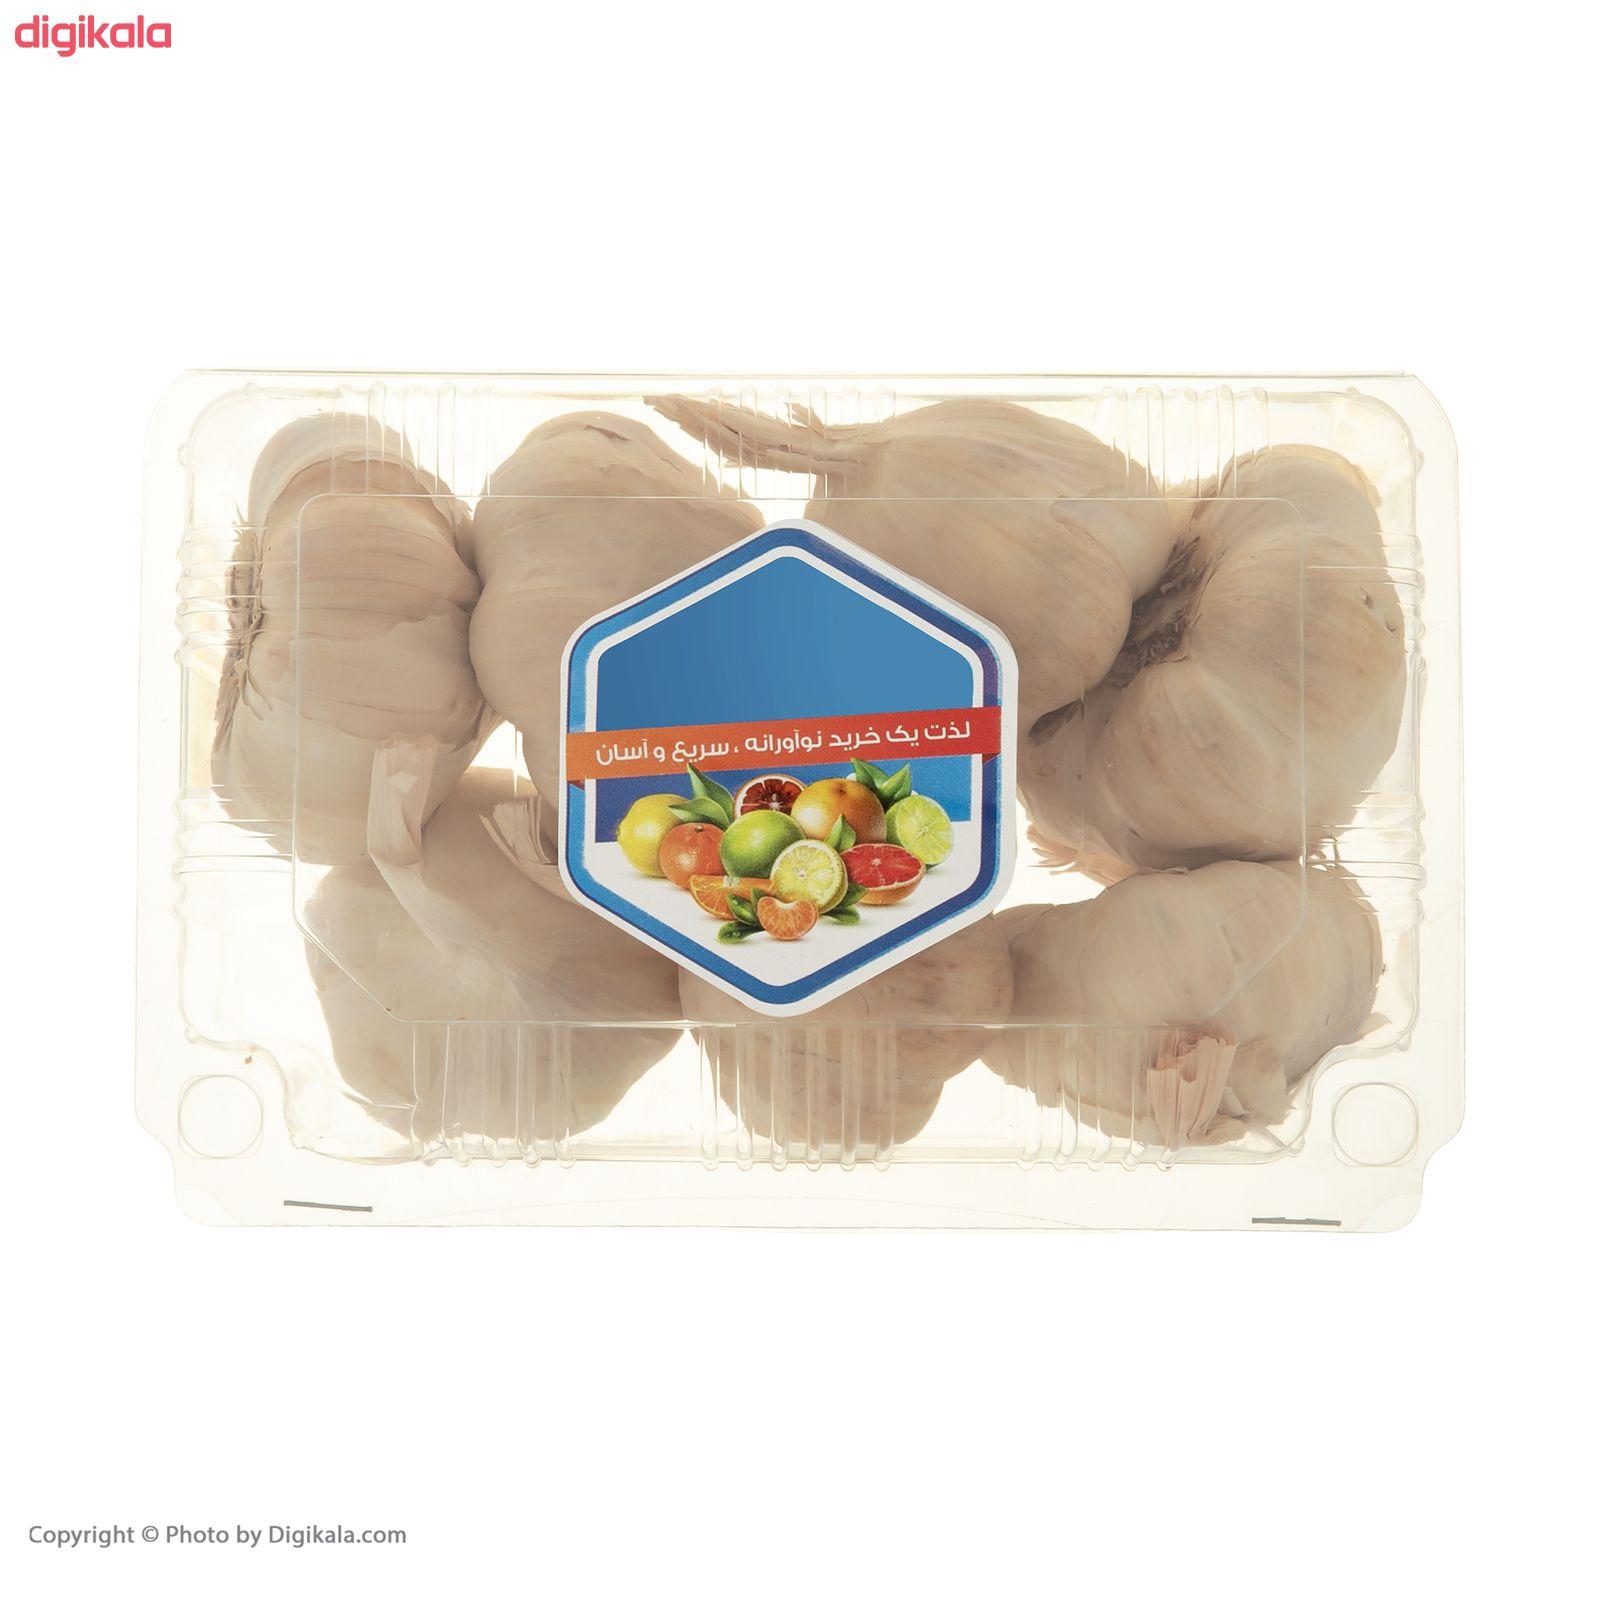 سیر خشک میوه پلاس - 500 گرم main 1 2